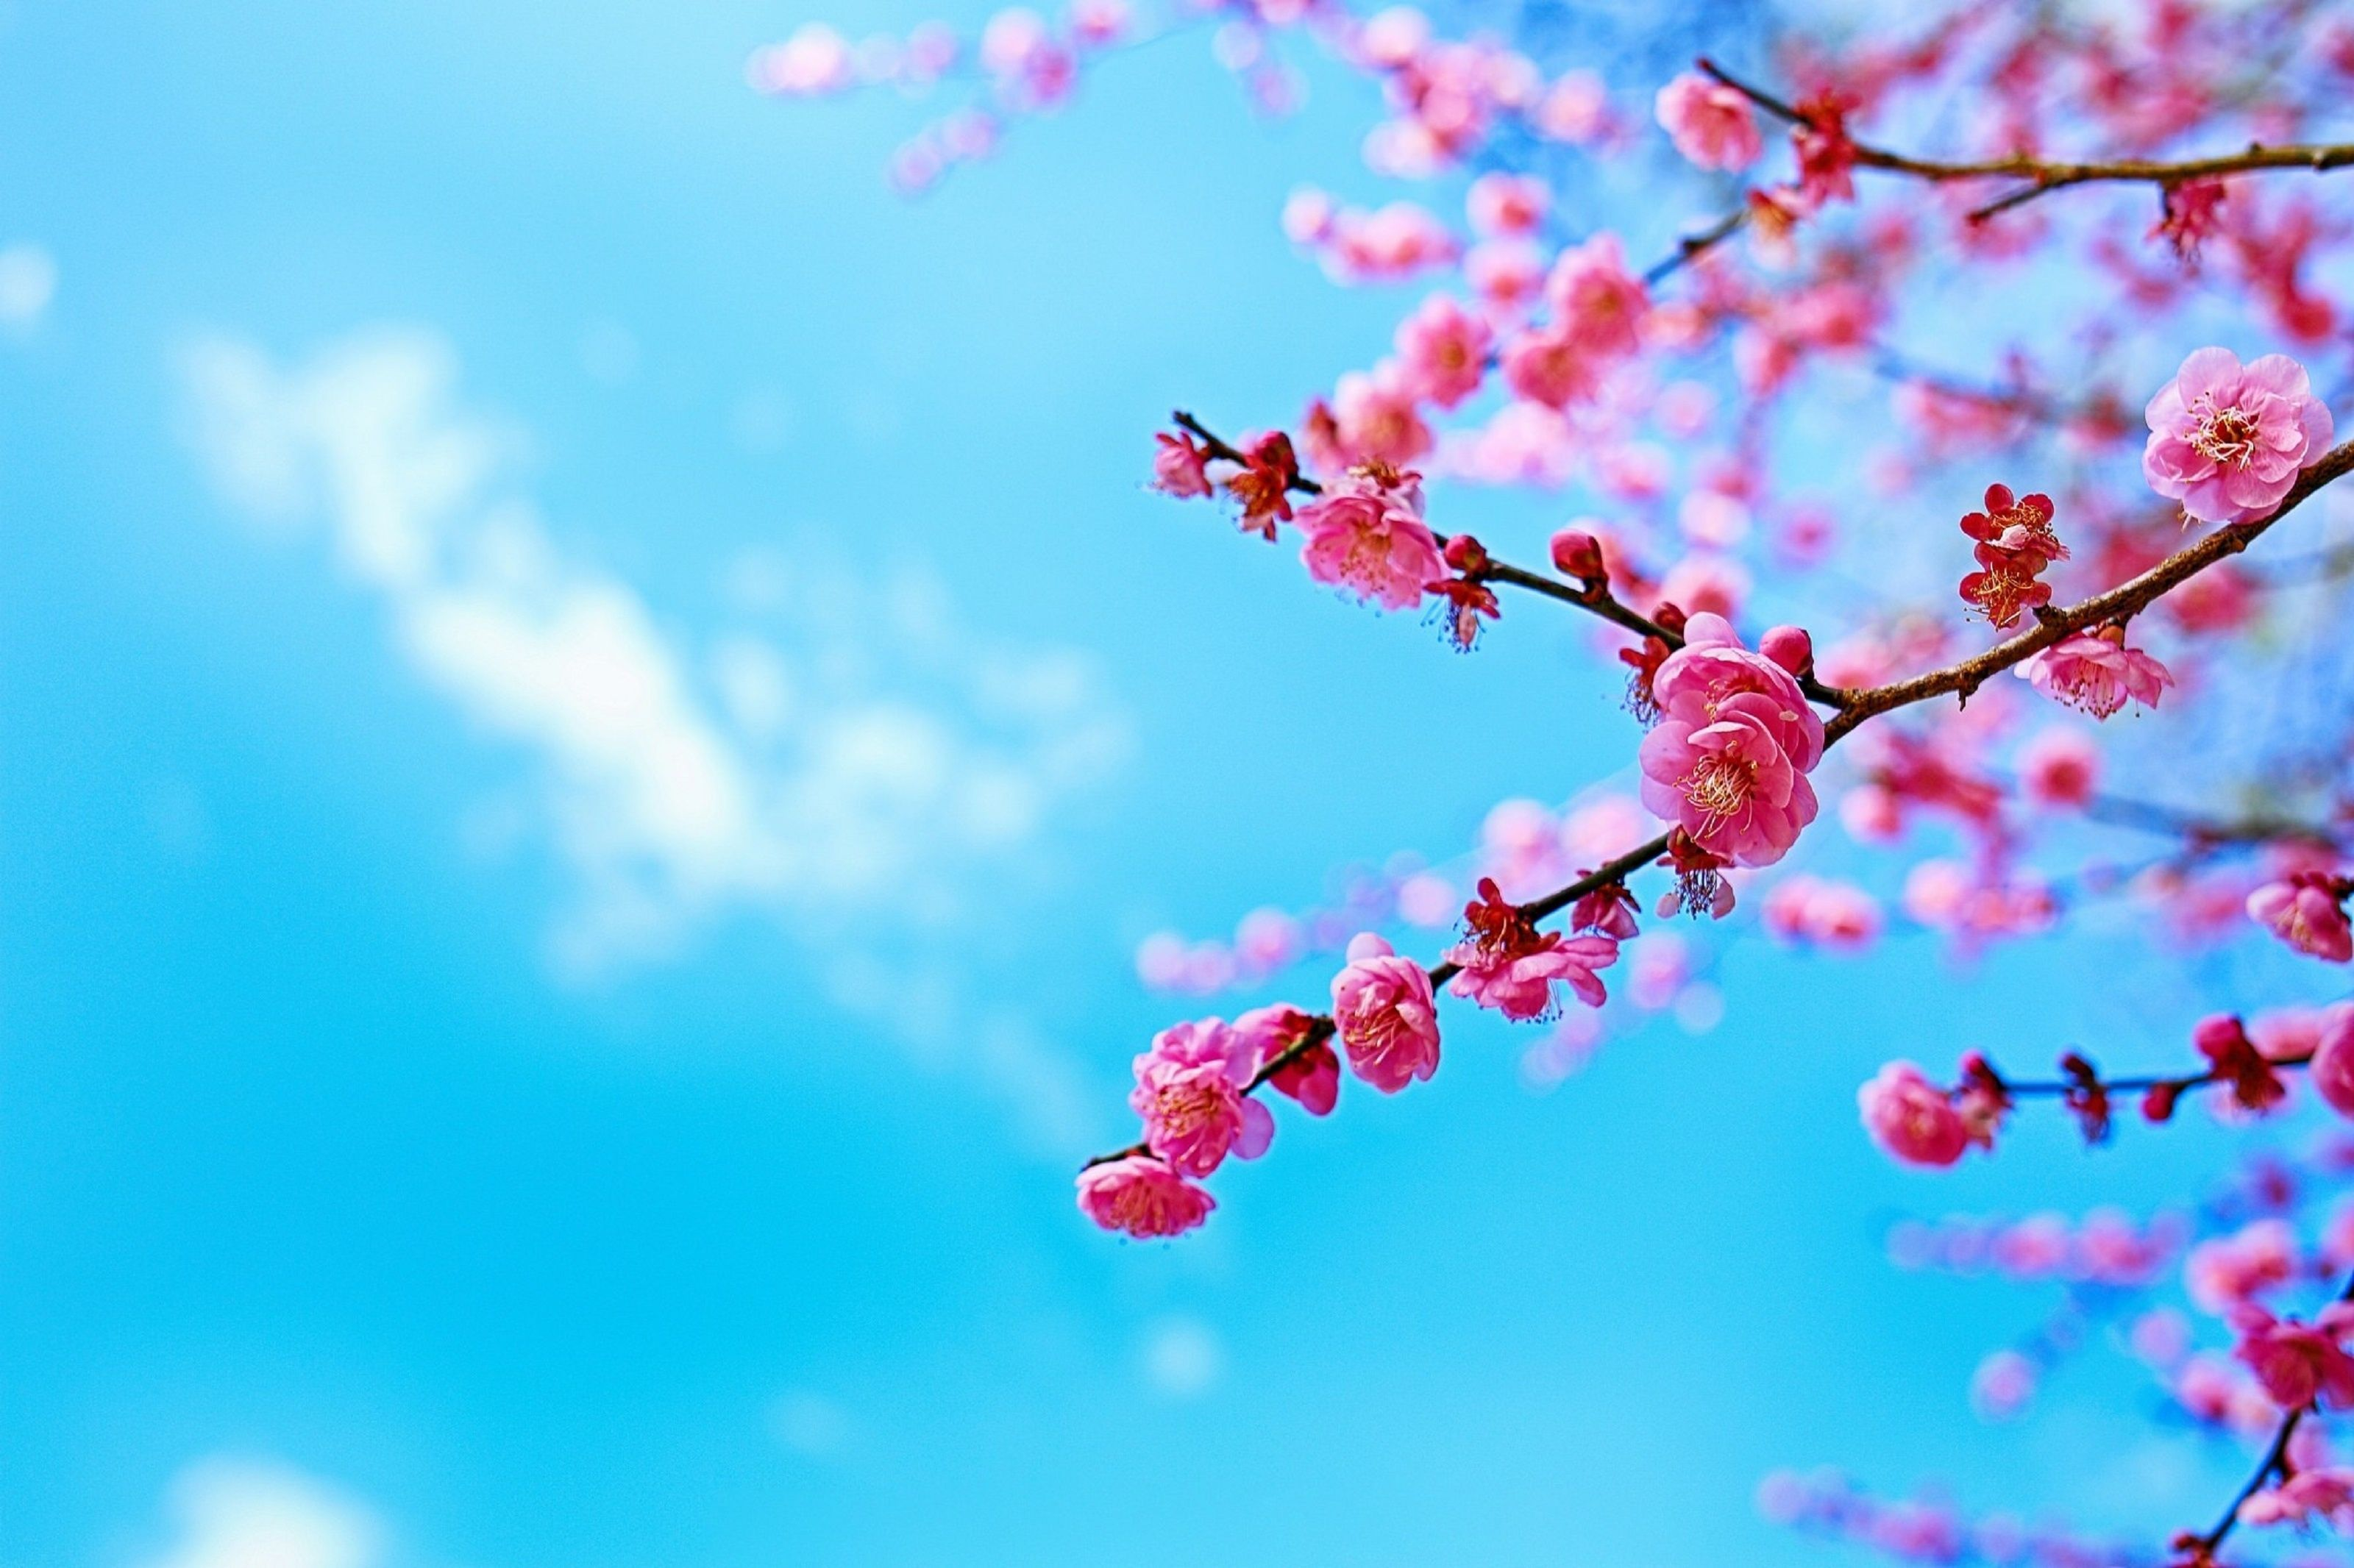 Картинки по запросу обои на рабочий стол весна | Картинки ...